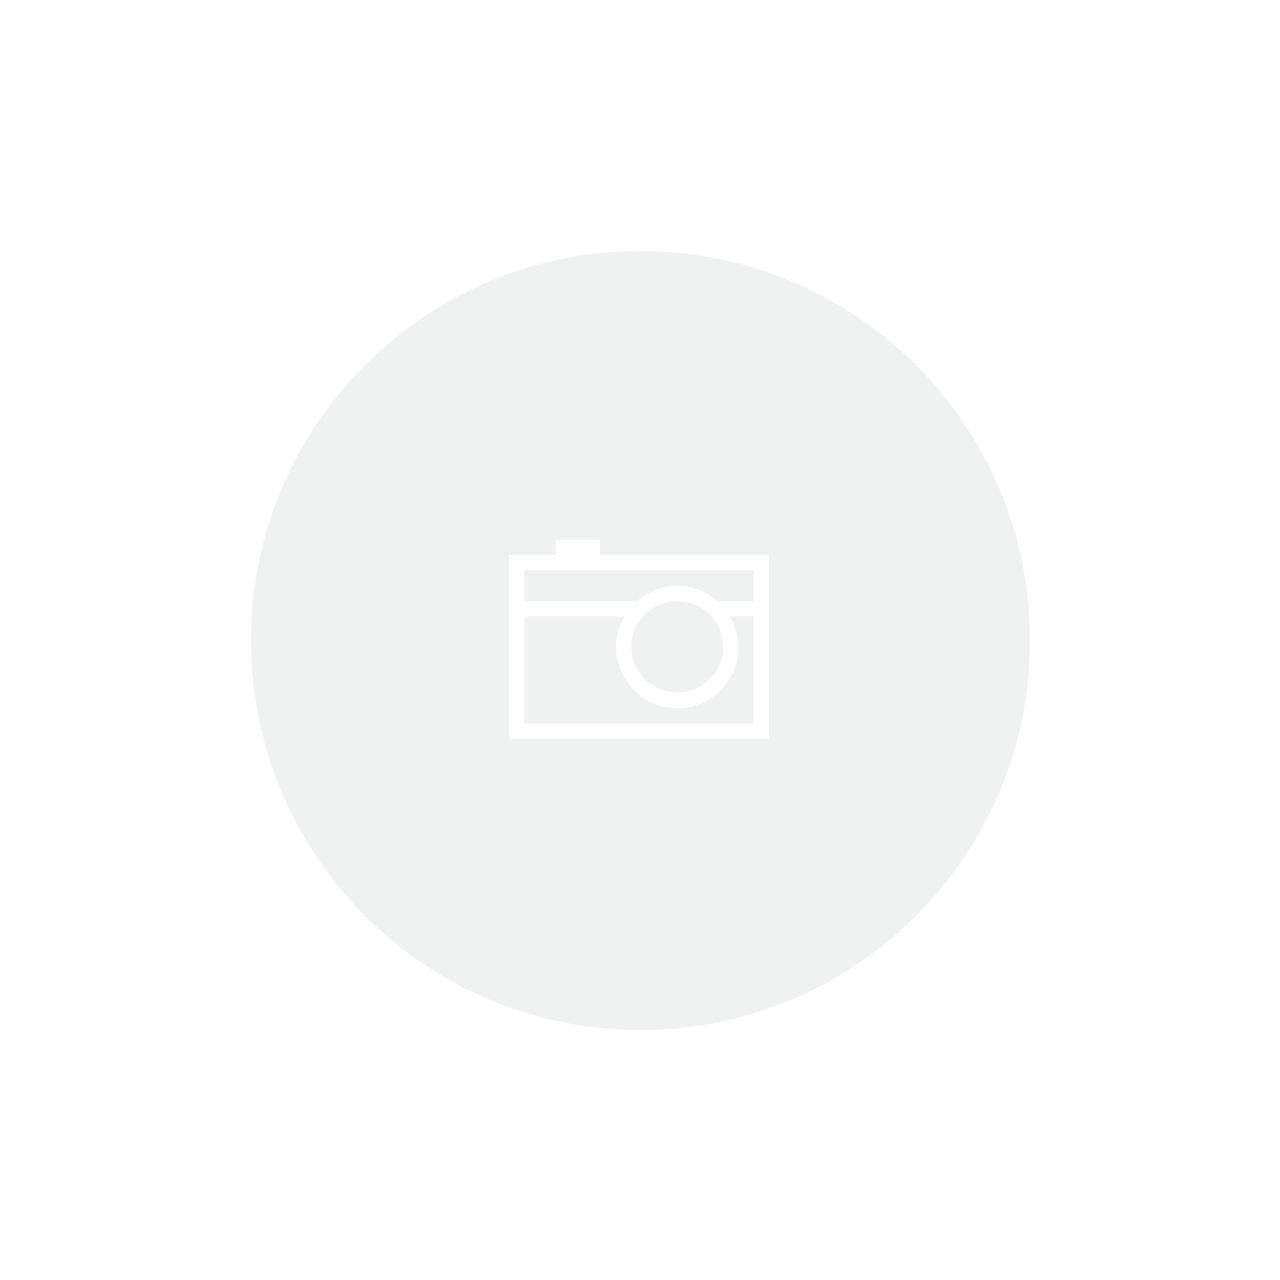 Placa Mãe Gigabyte H370 Aorus Placa Mãe Gigabyte H370 Aorus Gaming 3 RGB LED - LGA1151